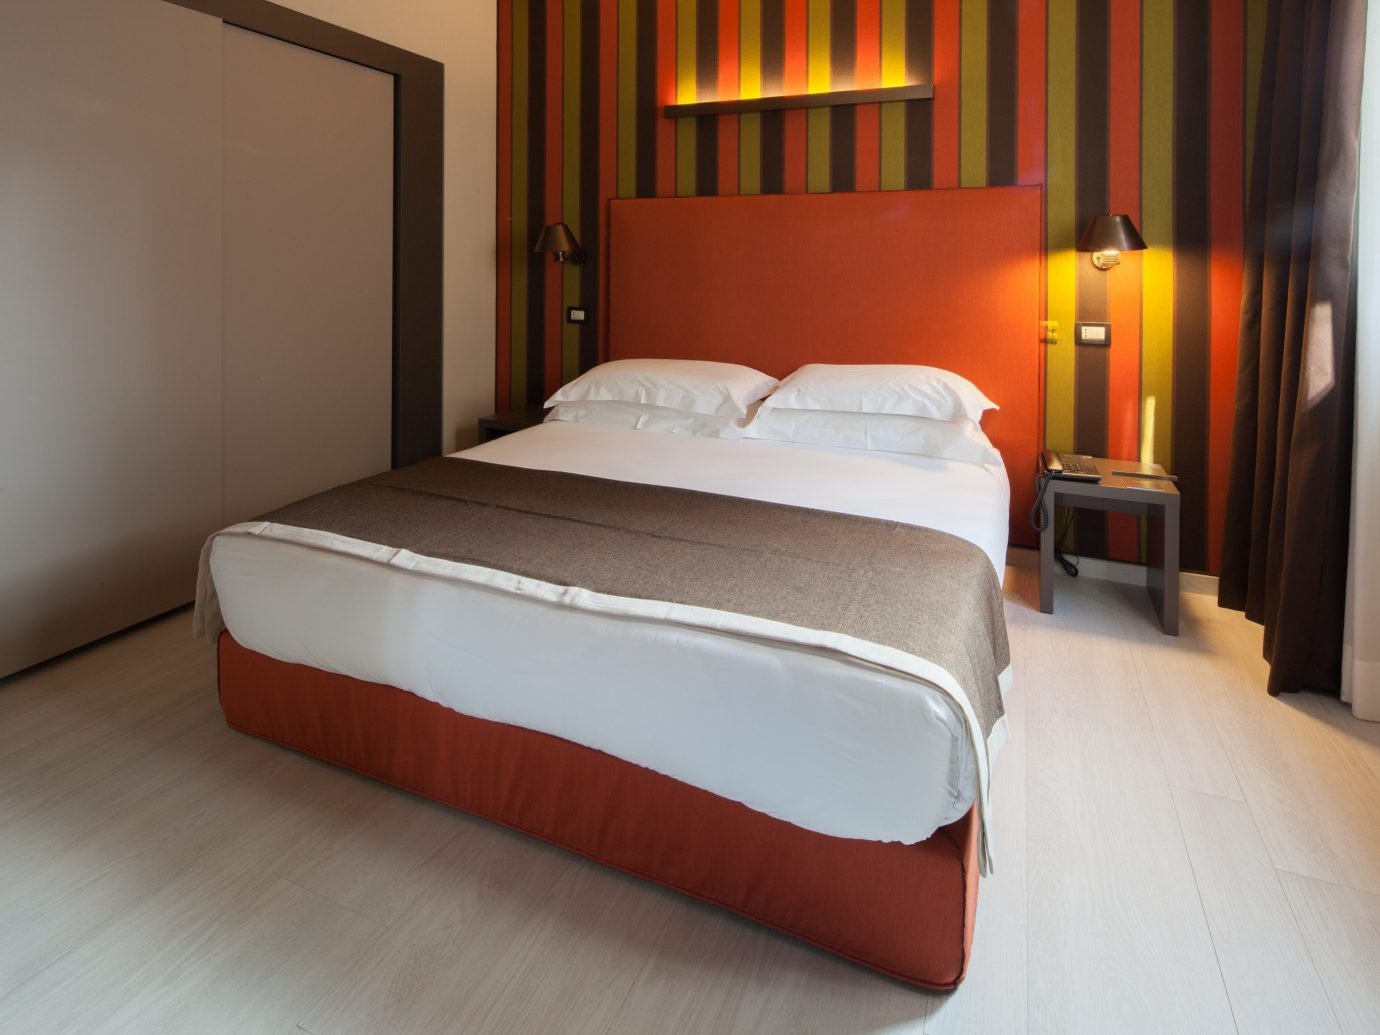 Hotels Italy Milan bed floor wall indoor Bedroom room Suite bed frame hotel furniture interior design real estate mattress comfort bed sheet